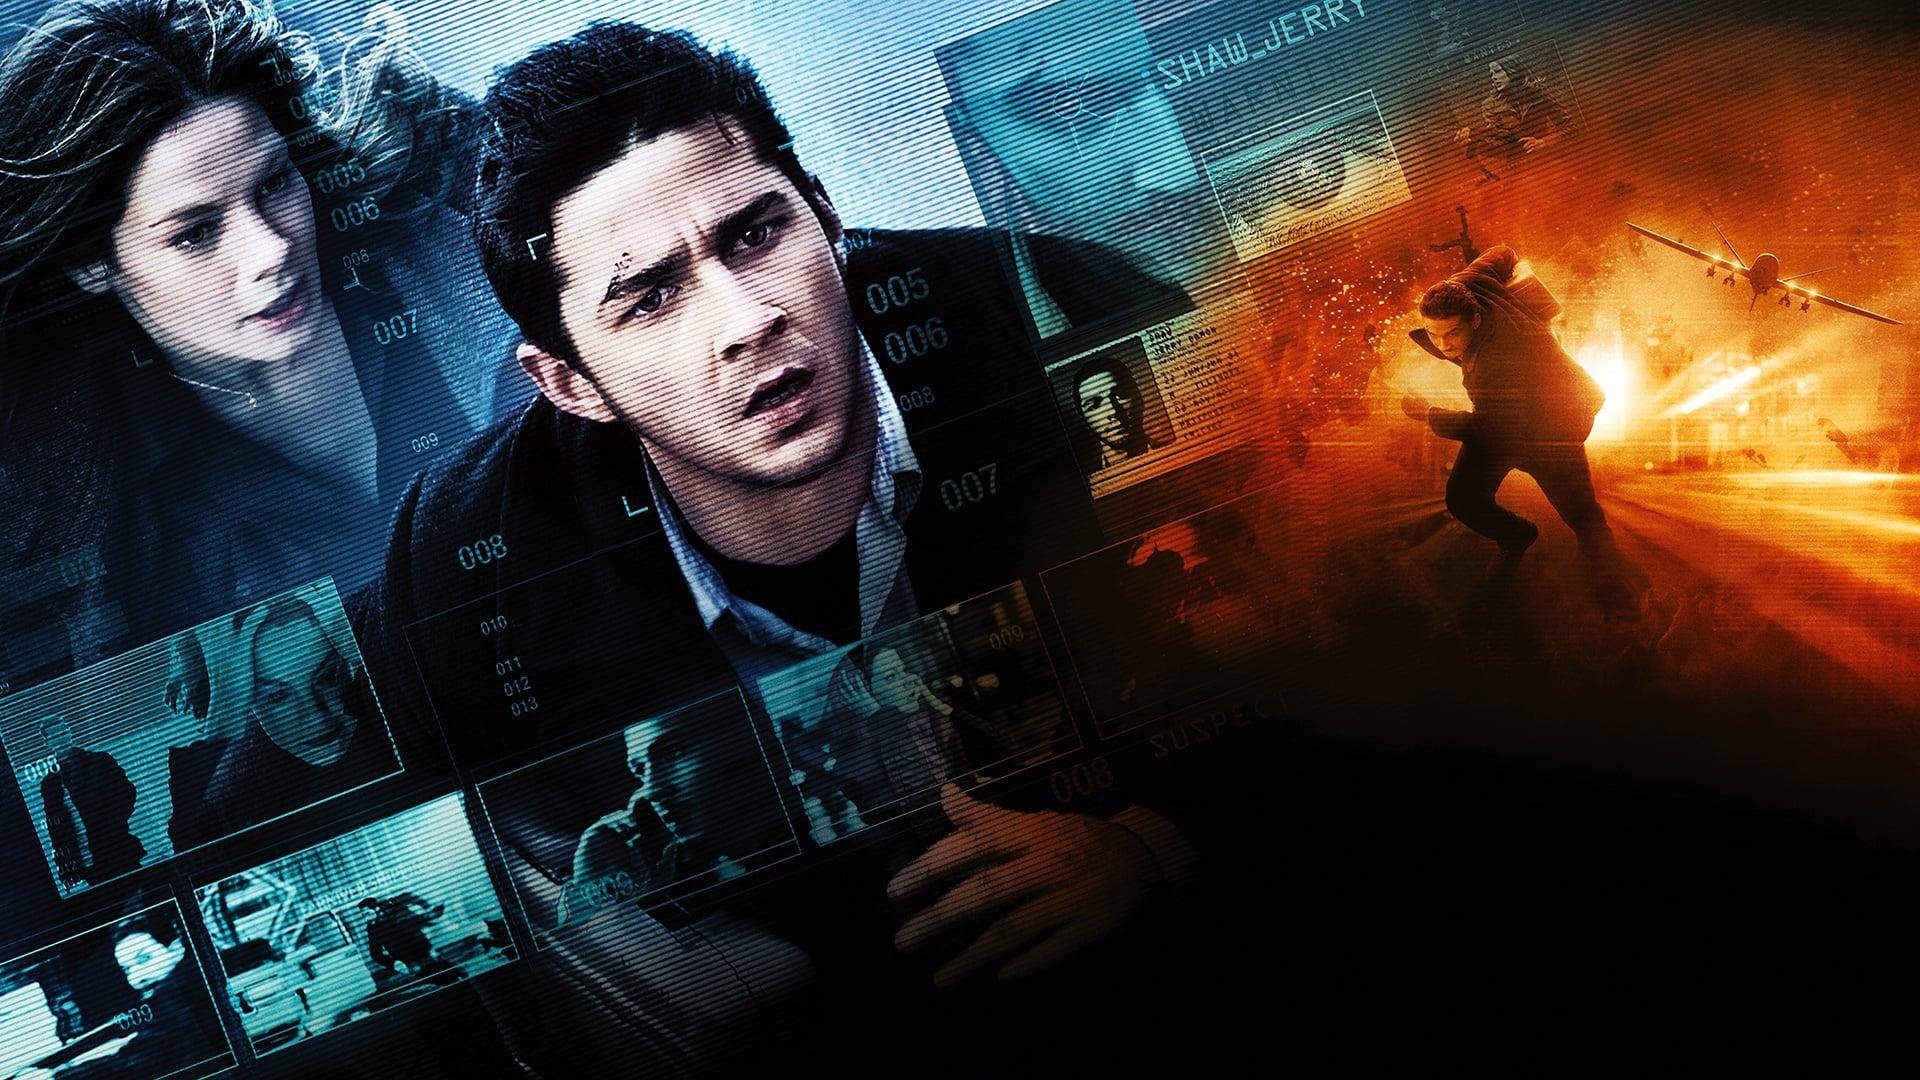 eagle eye full movie online free